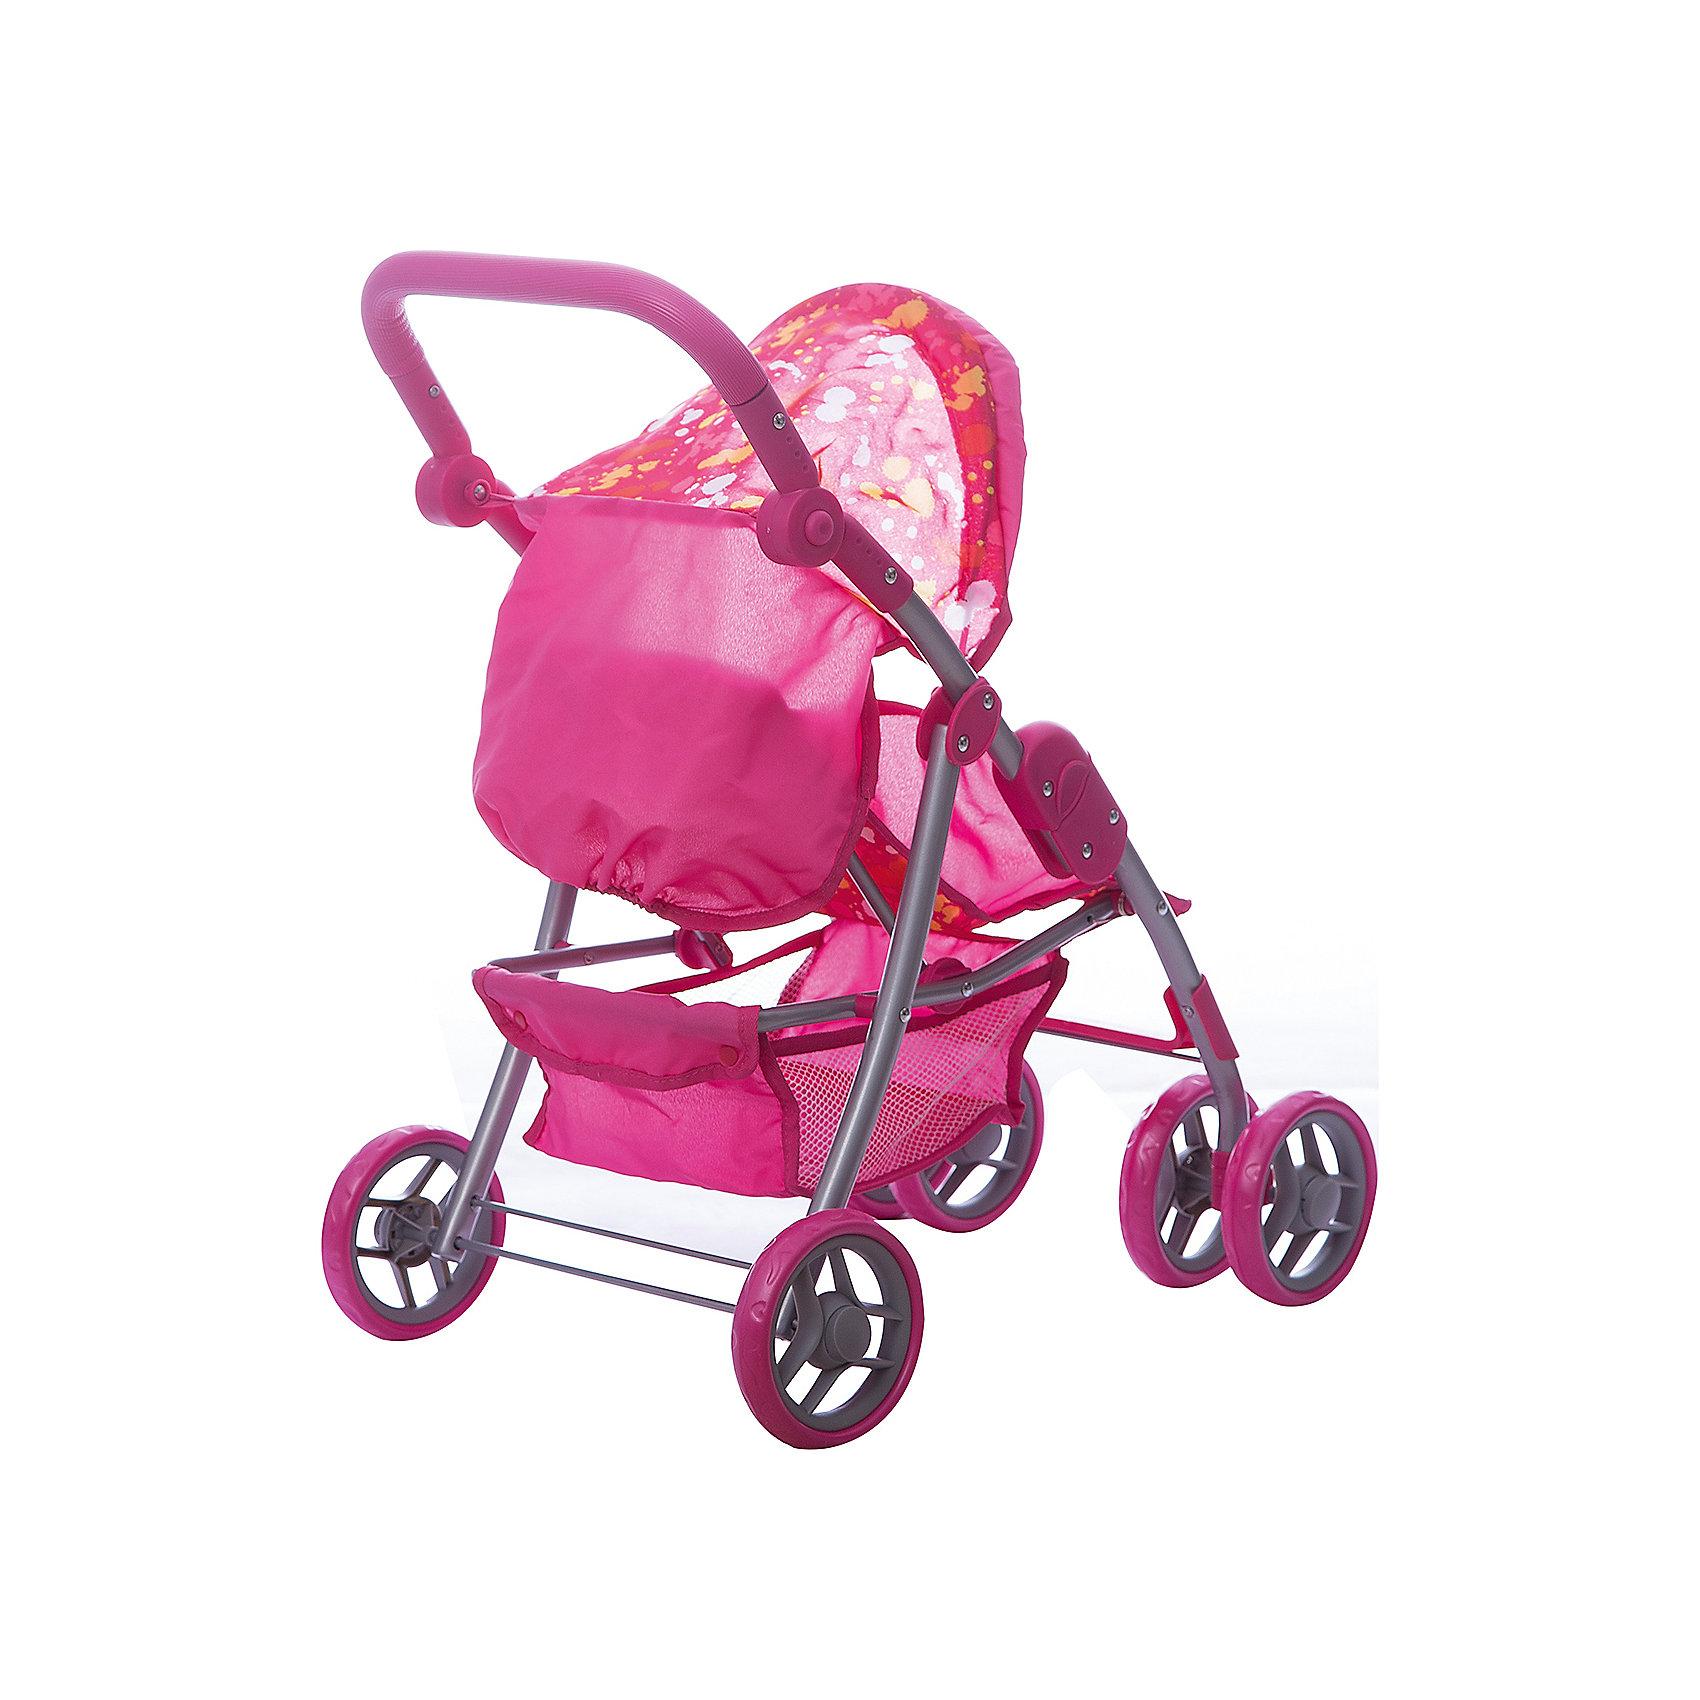 картинки колясок розовая грусти ведь вернёшься